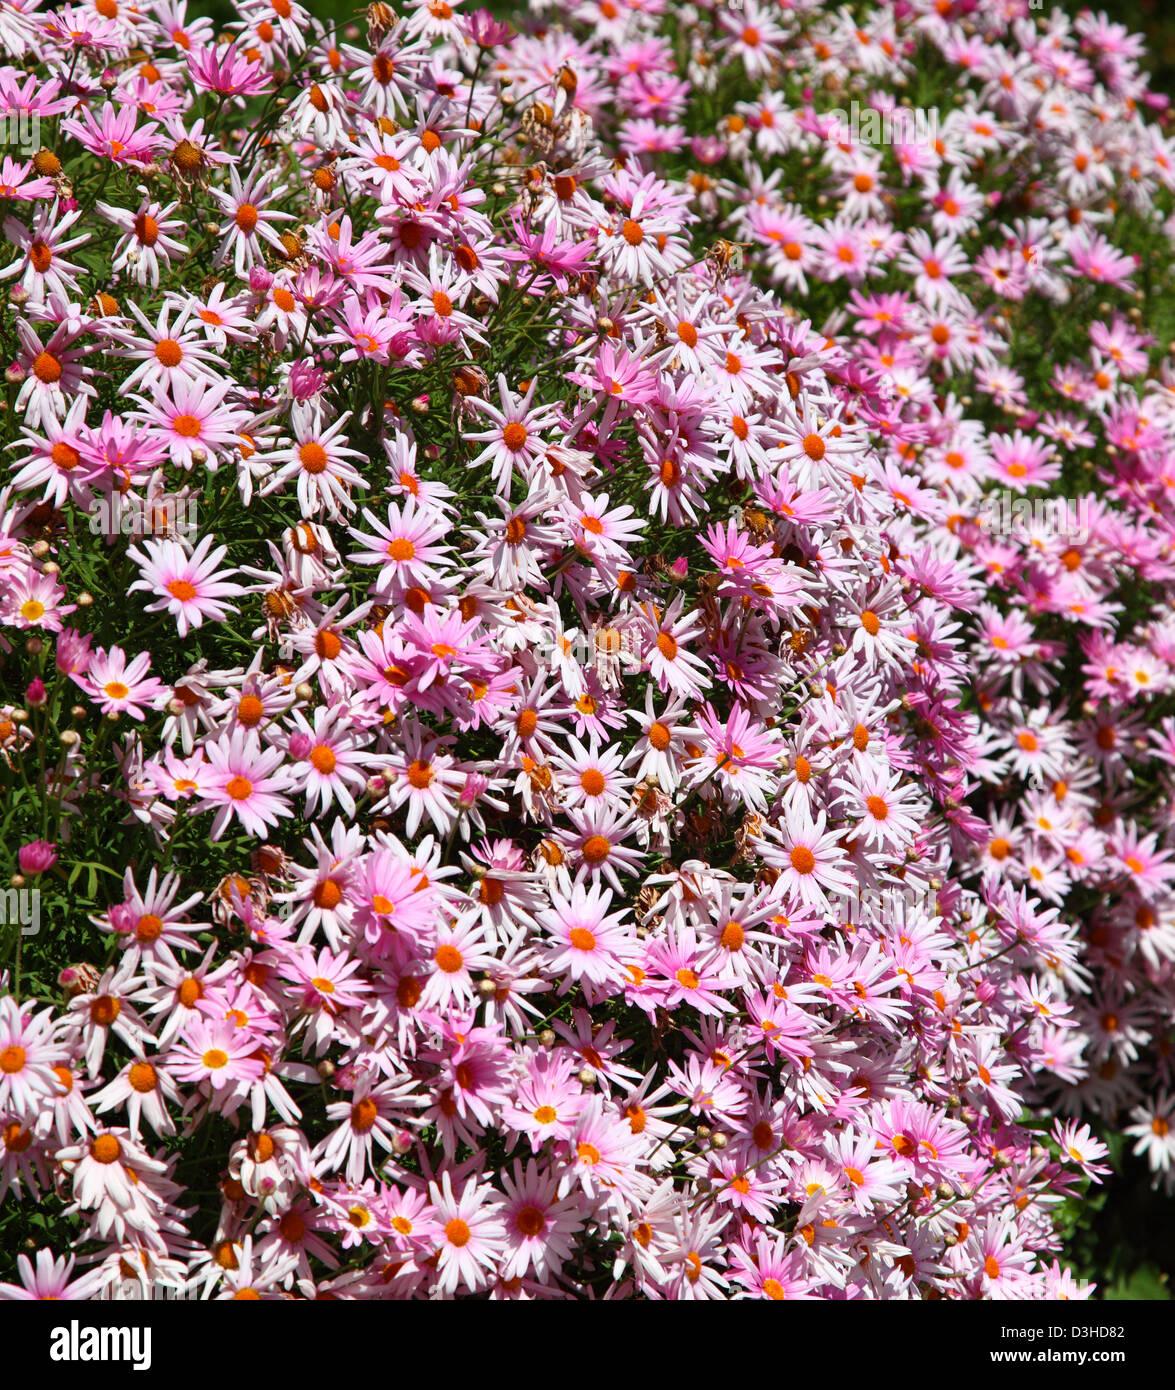 Eastern purple coneflower flowers - Stock Image